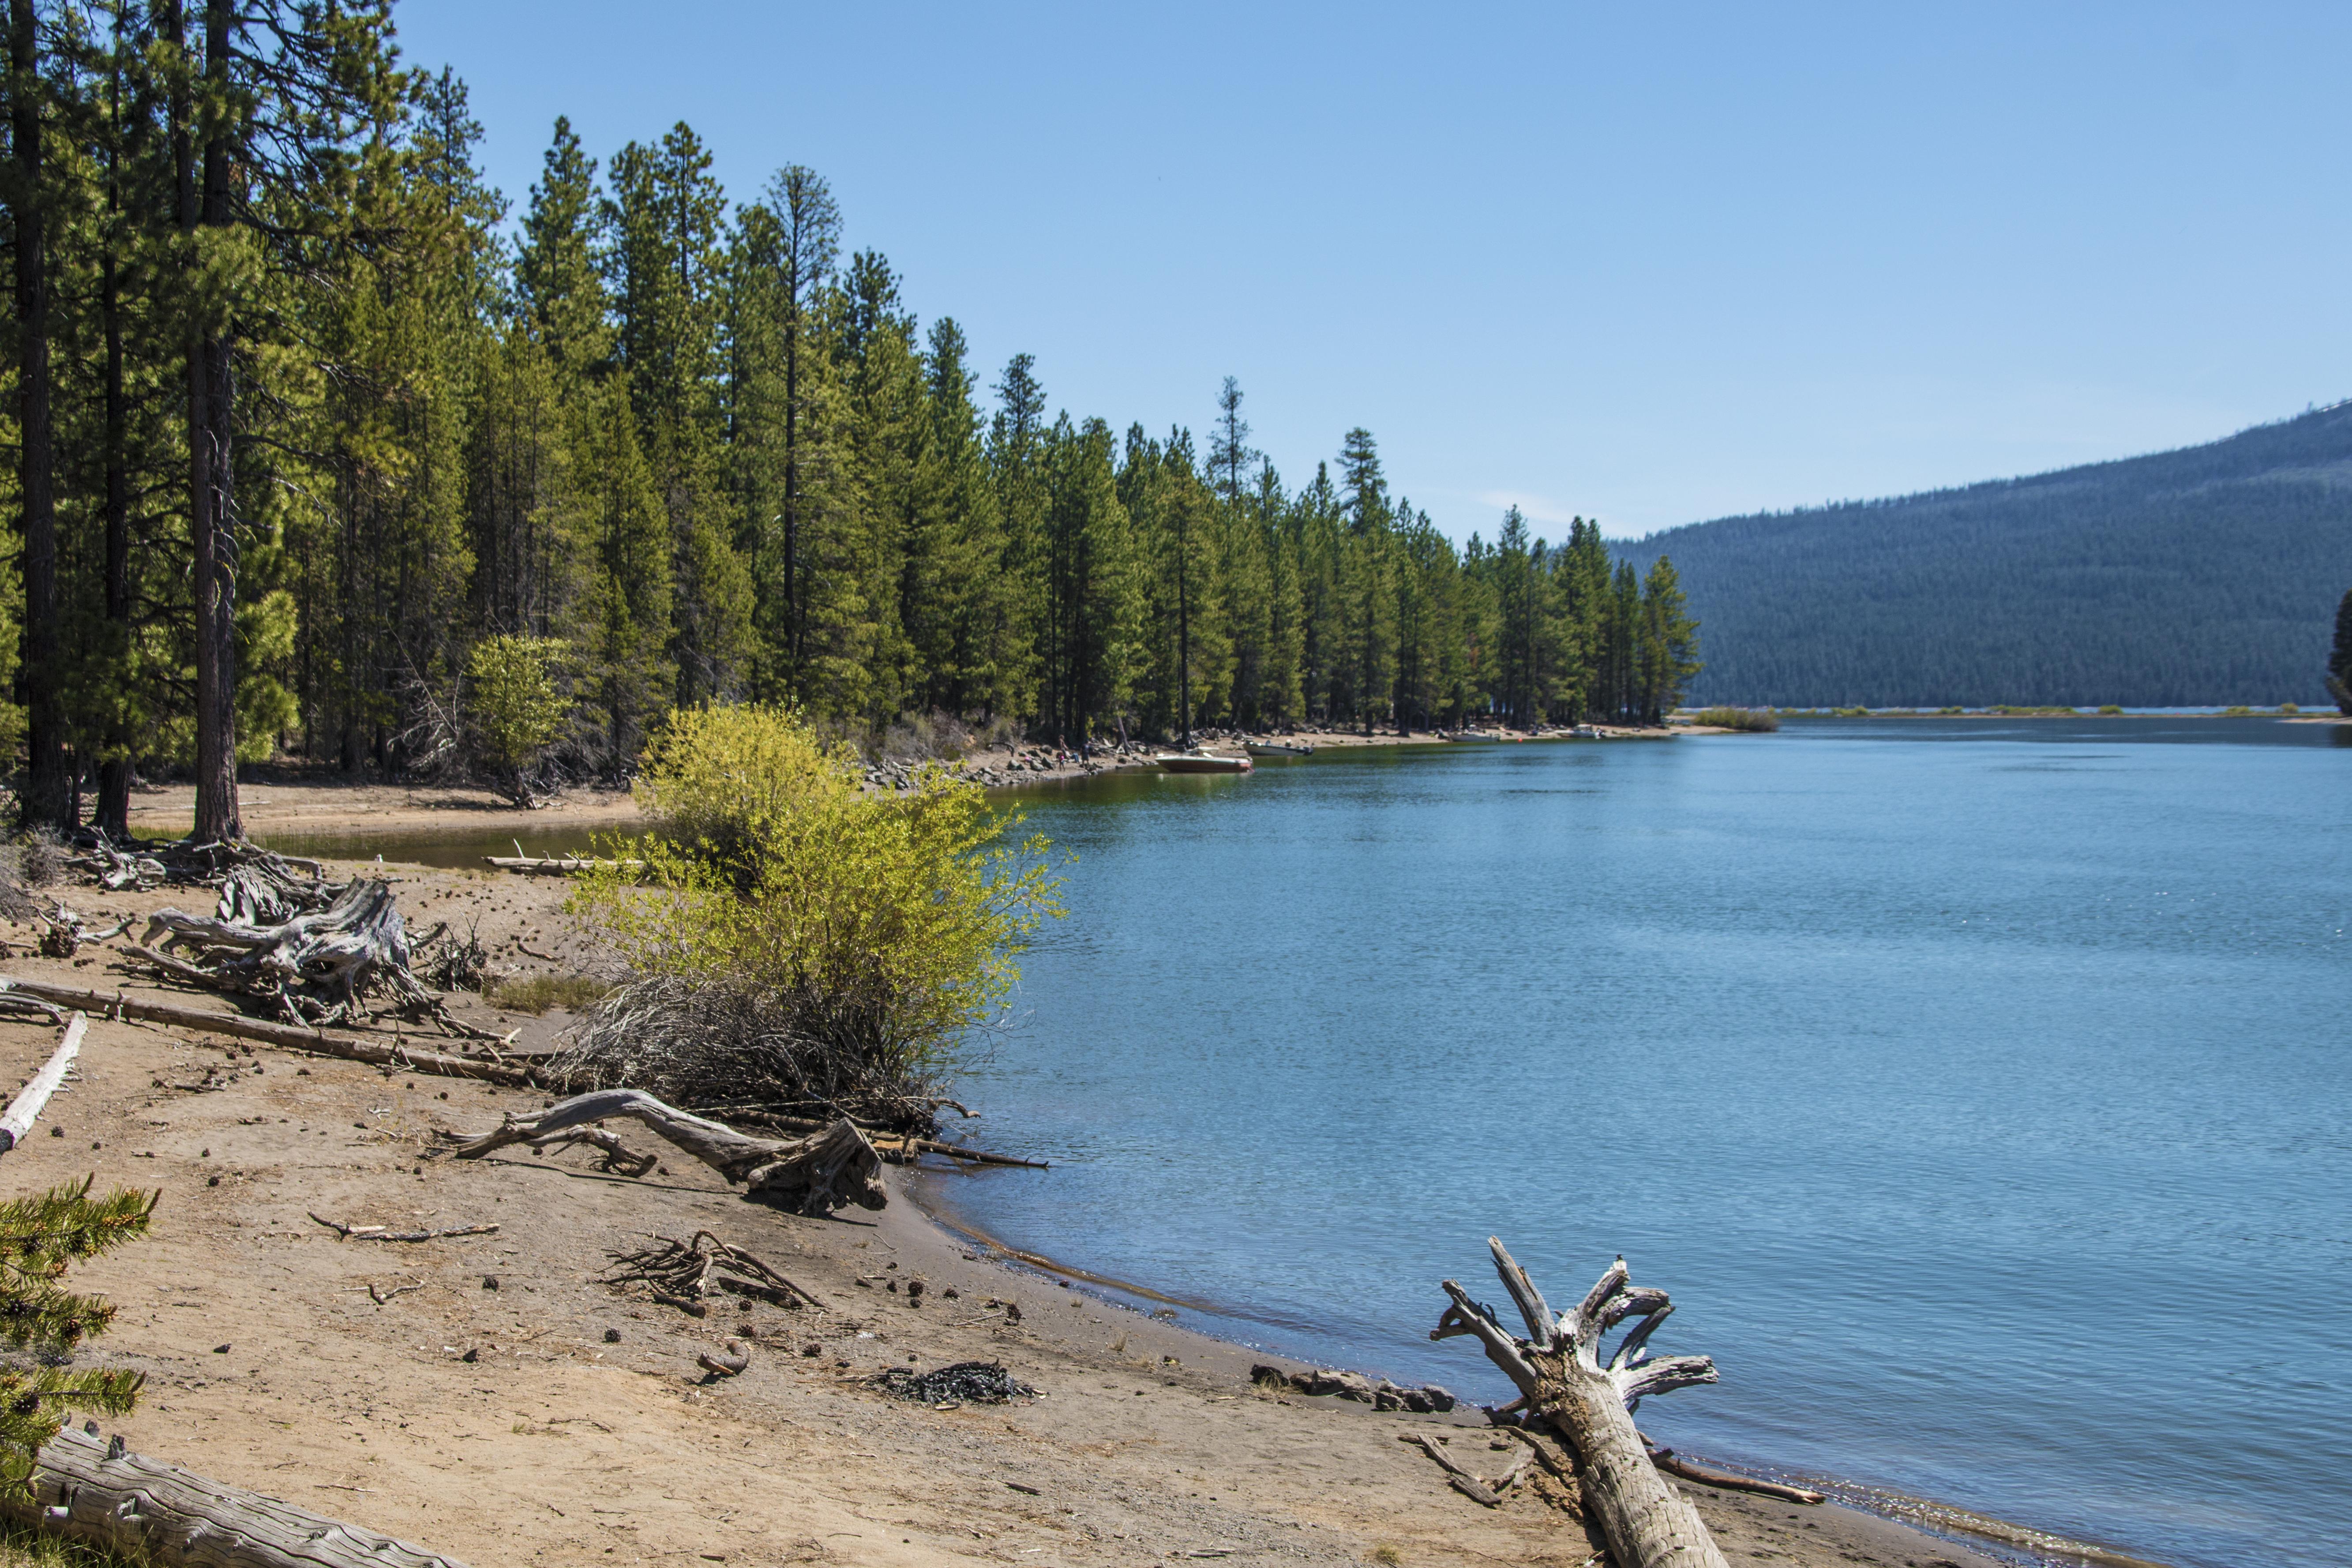 Wickiup Reservoir, Oregon, Bay, Forest, Lake, Landscape, HQ Photo